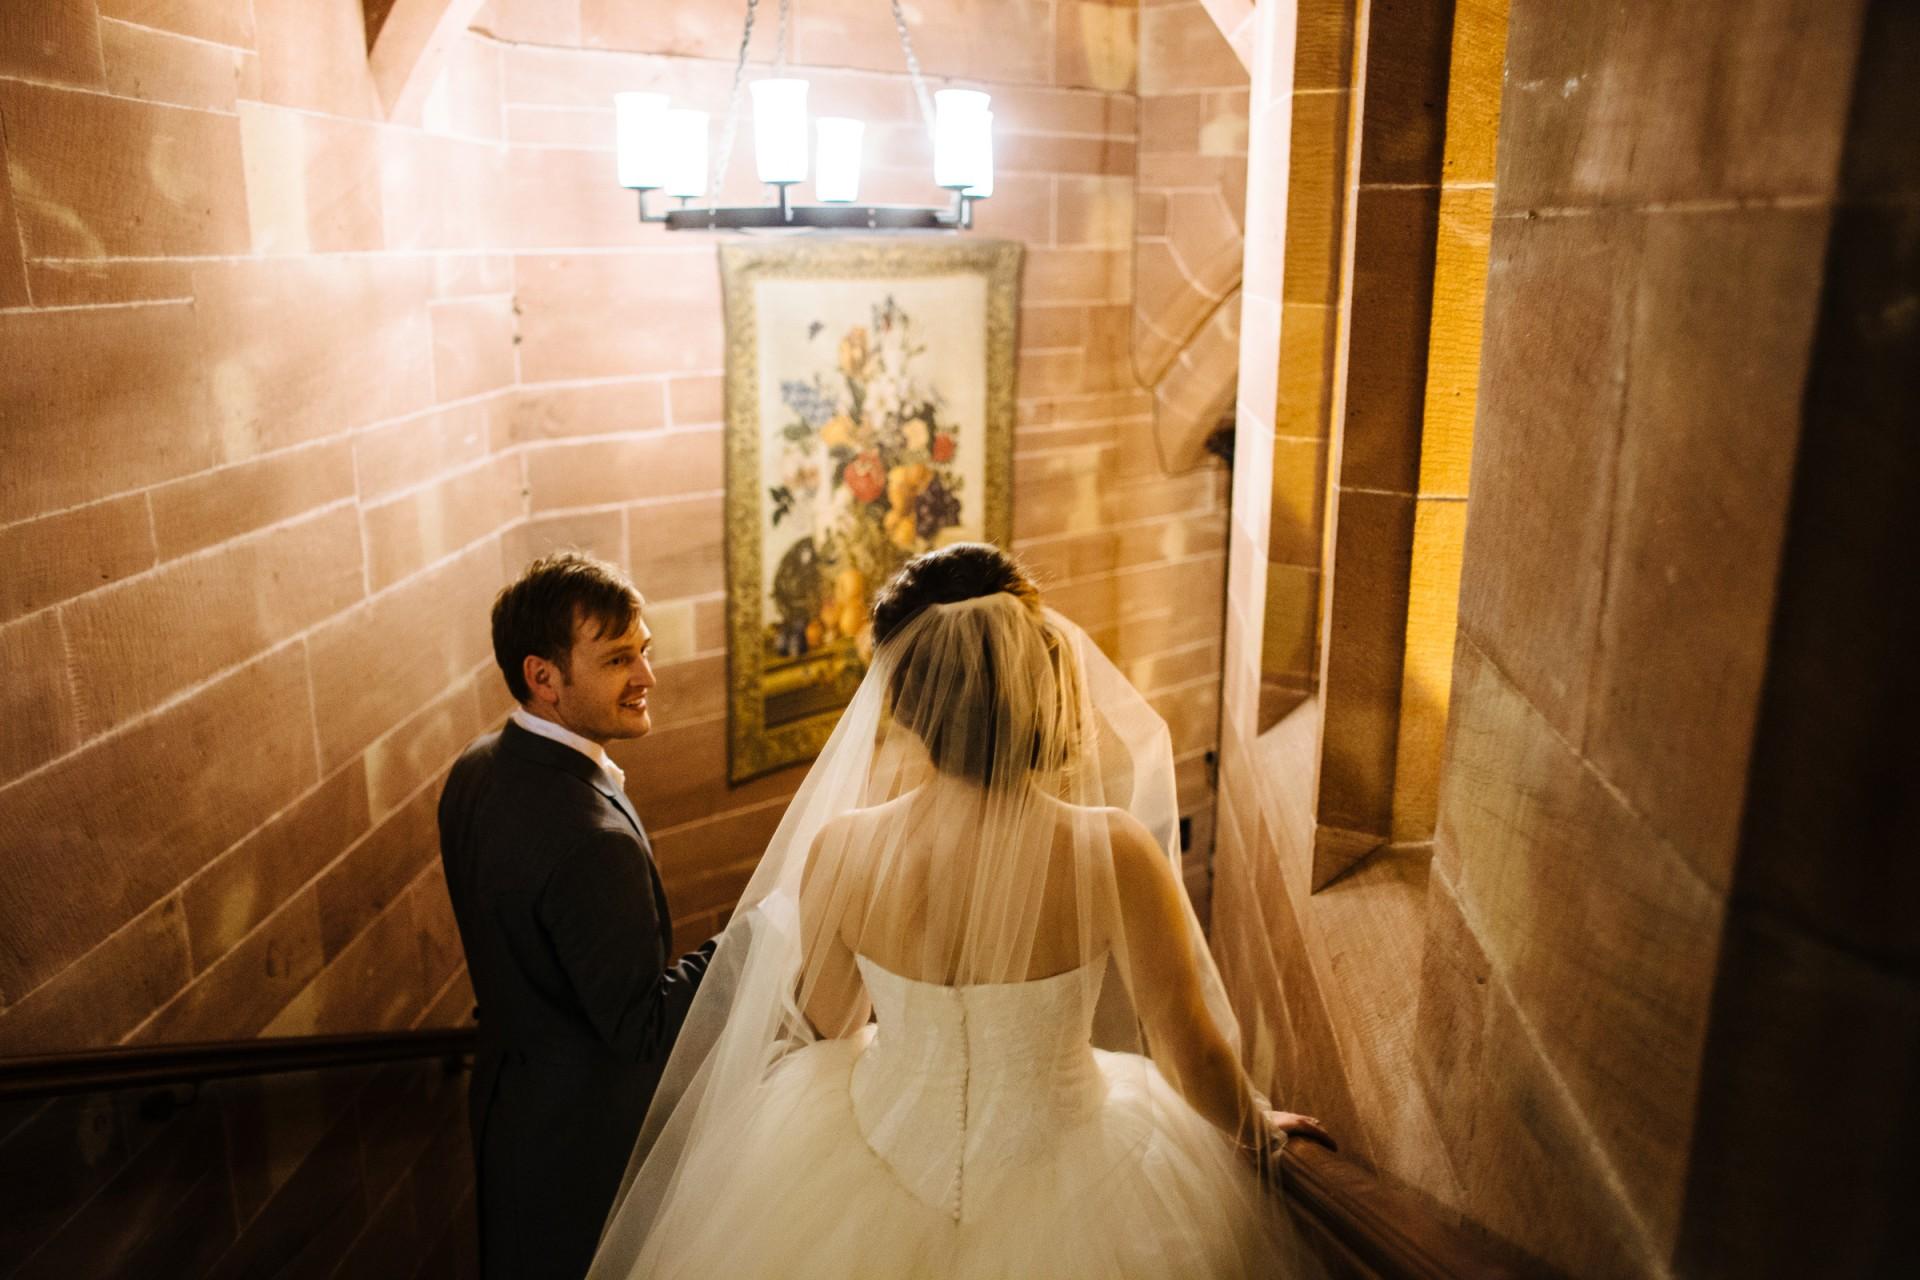 Katie-Joe_Sansom-Photography_New-Years-Eve-Wedding_034